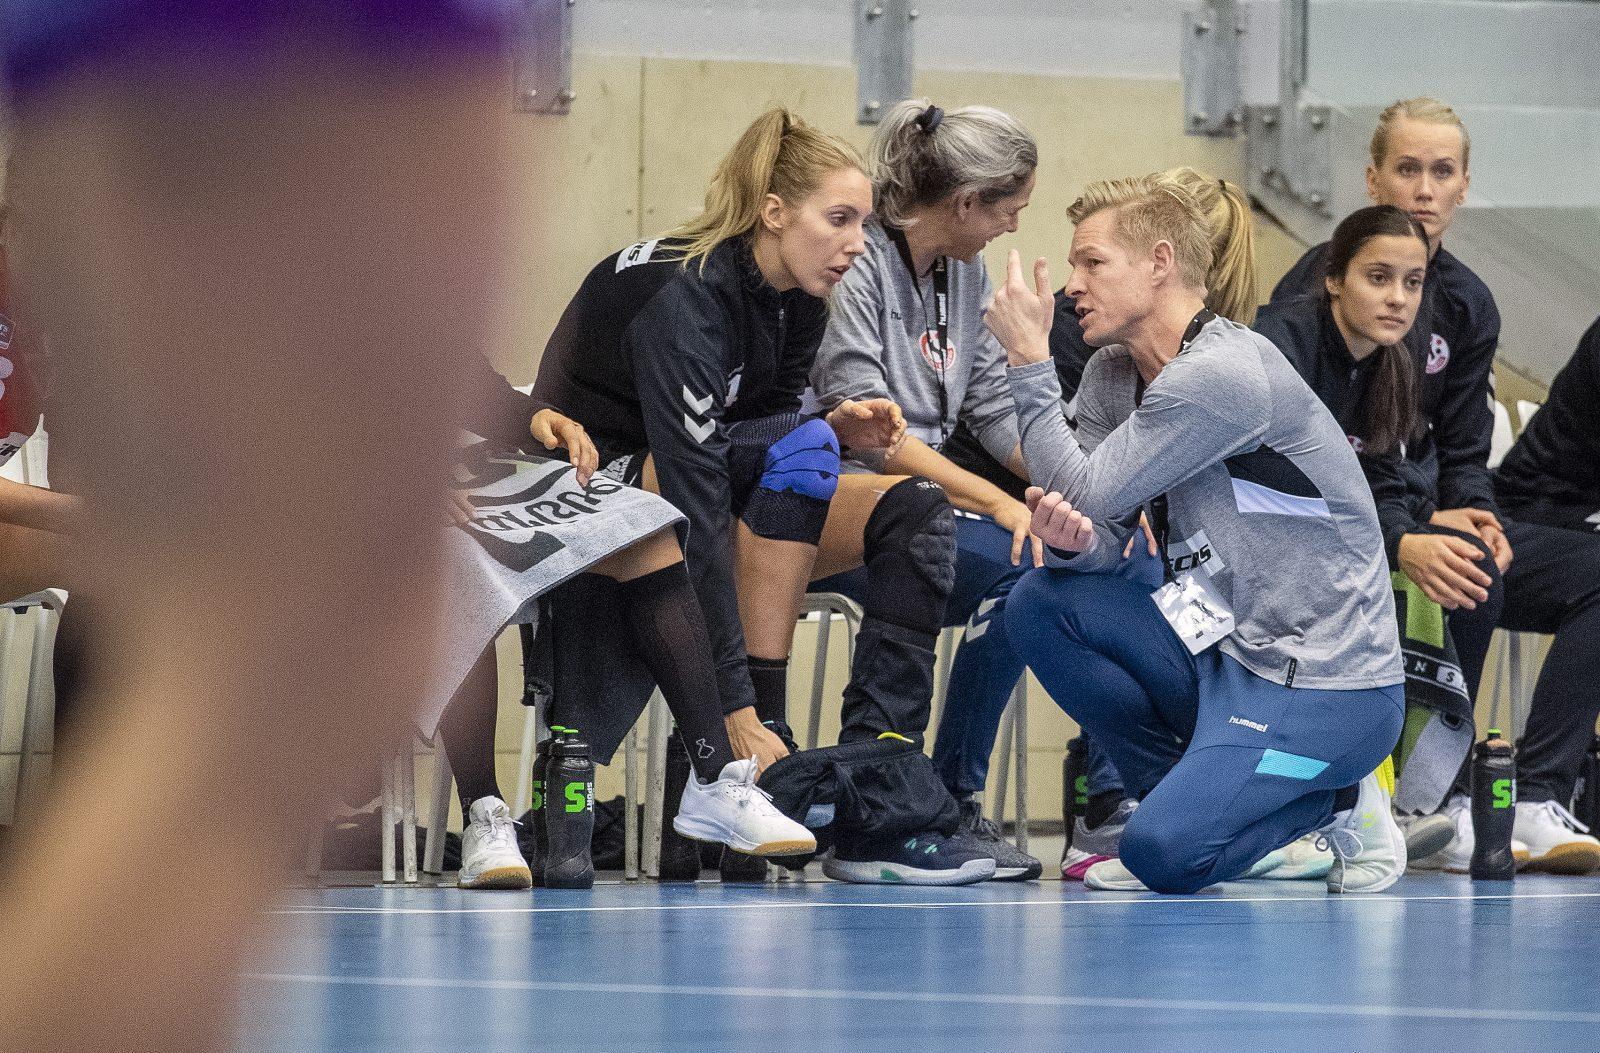 KvindehŒndbold: Team Esbjerg - Herning-Ikast HŒndbold